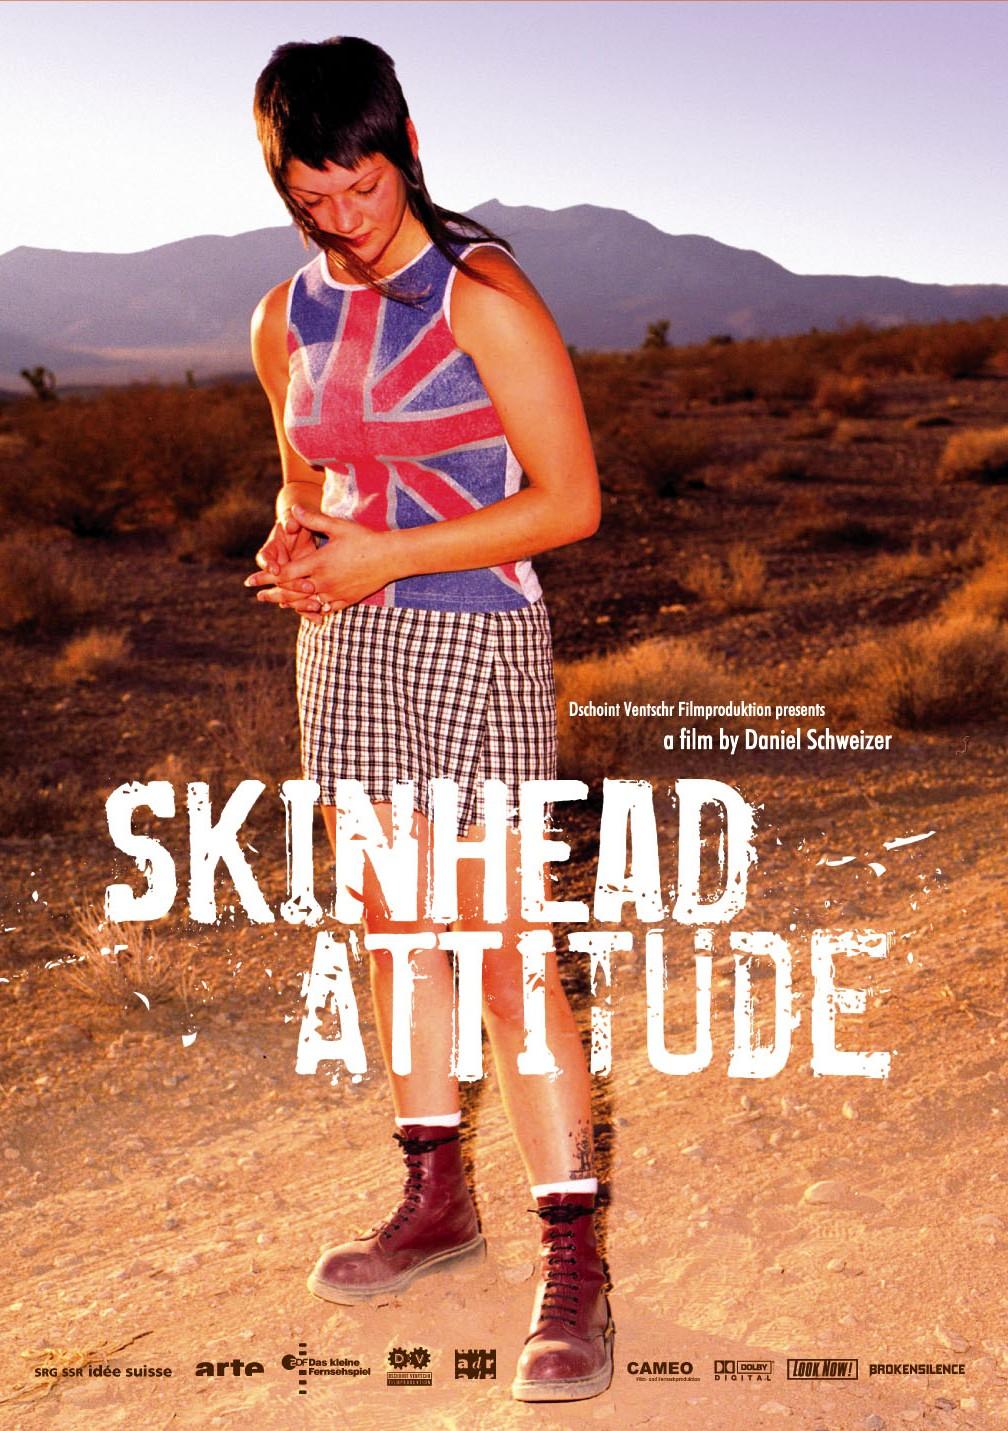 Być skinheadem / Skinhead attitude